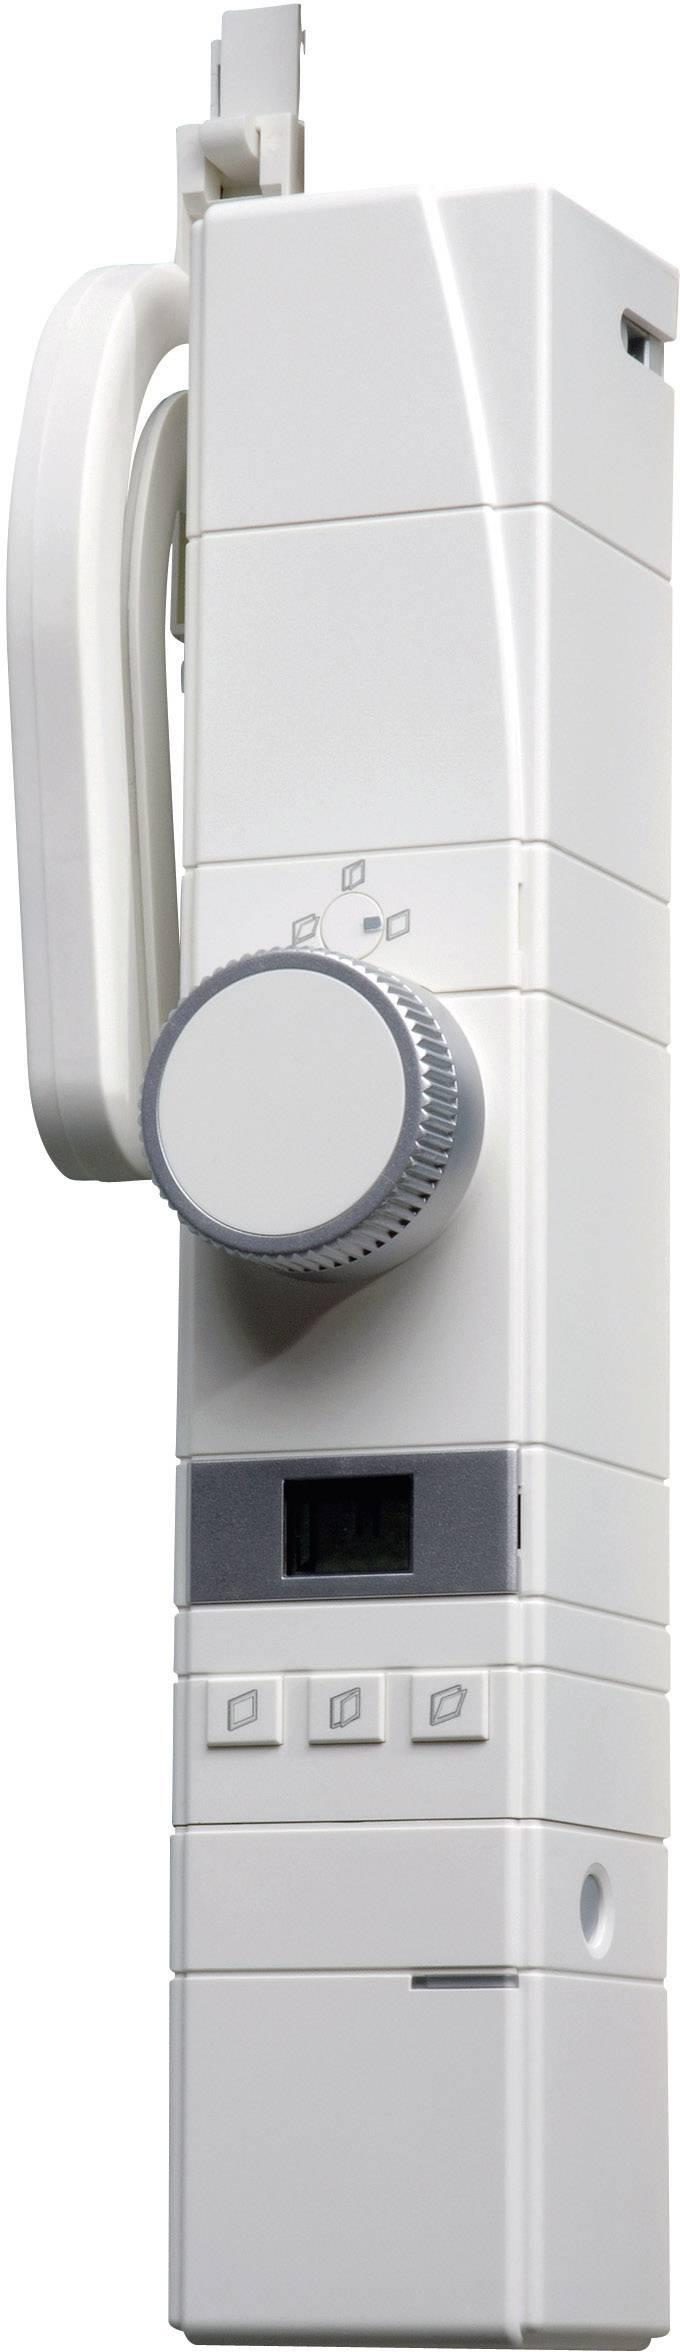 Otvárač okien HomeMatic Winmatic s akumulátorom